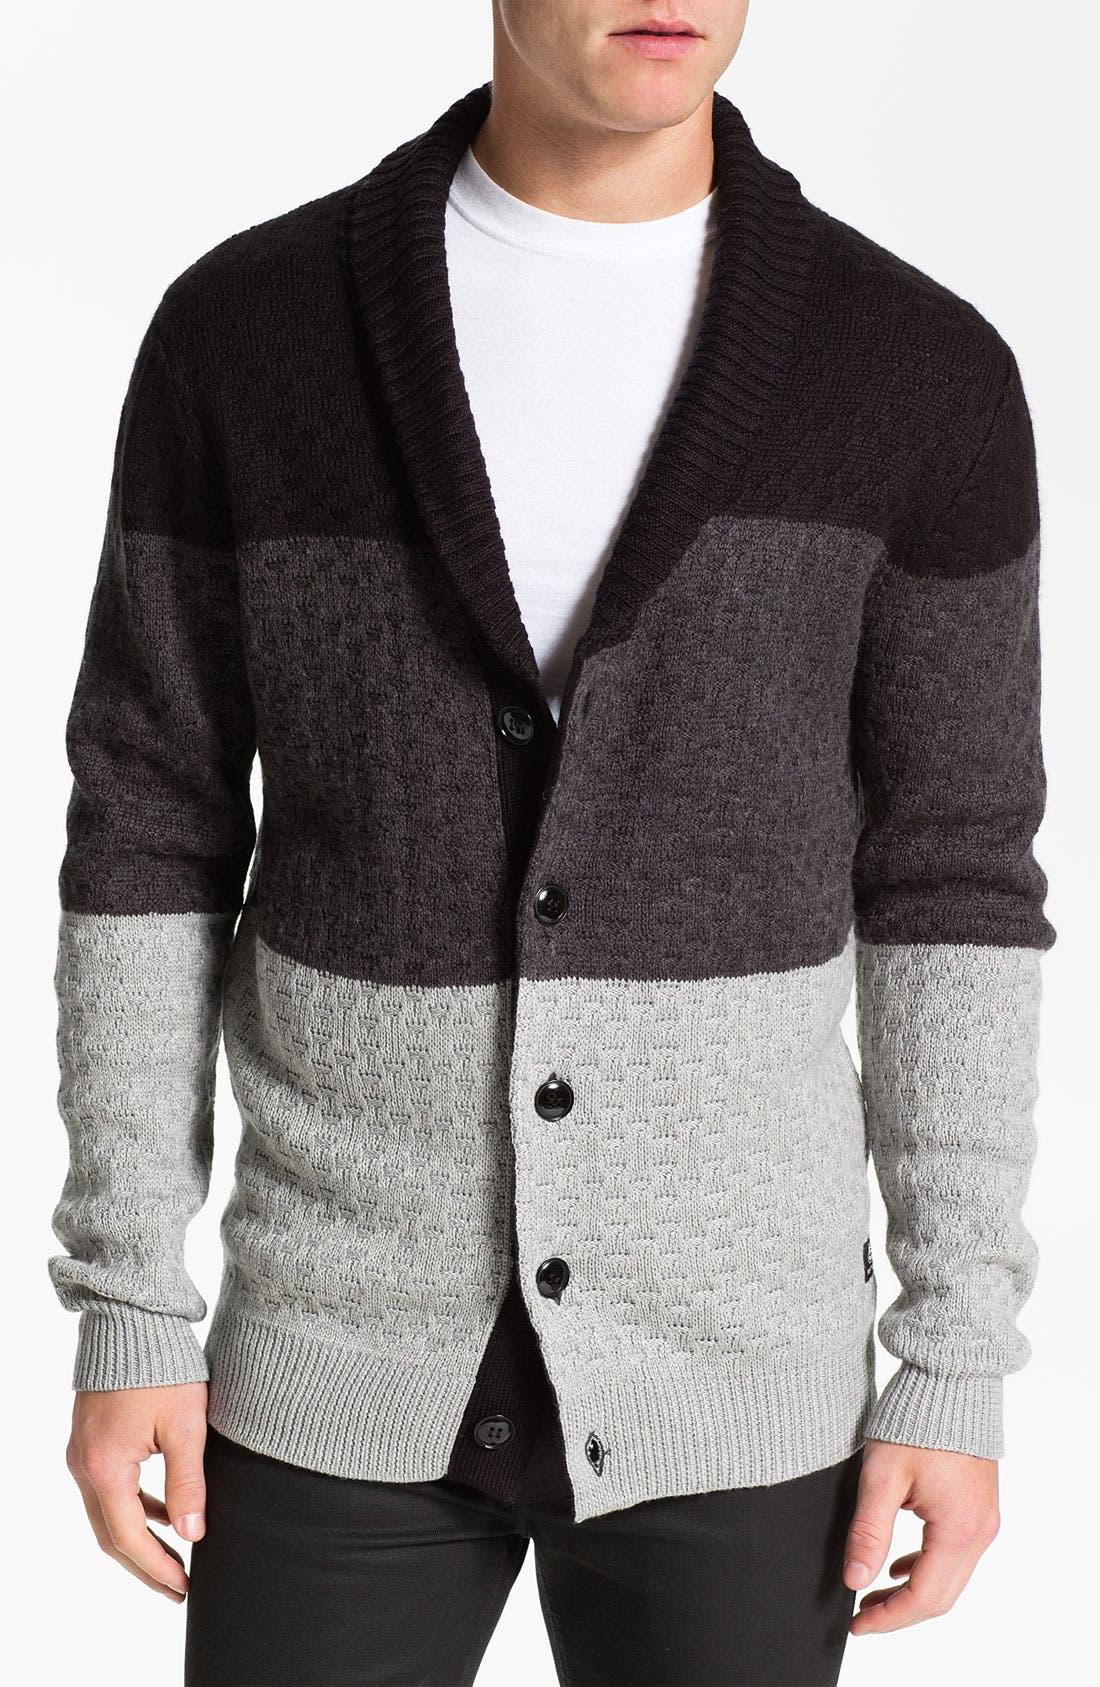 Alternate Image 1 Selected - 55DSL 'Kanfyl' Shawl Collar Cardigan